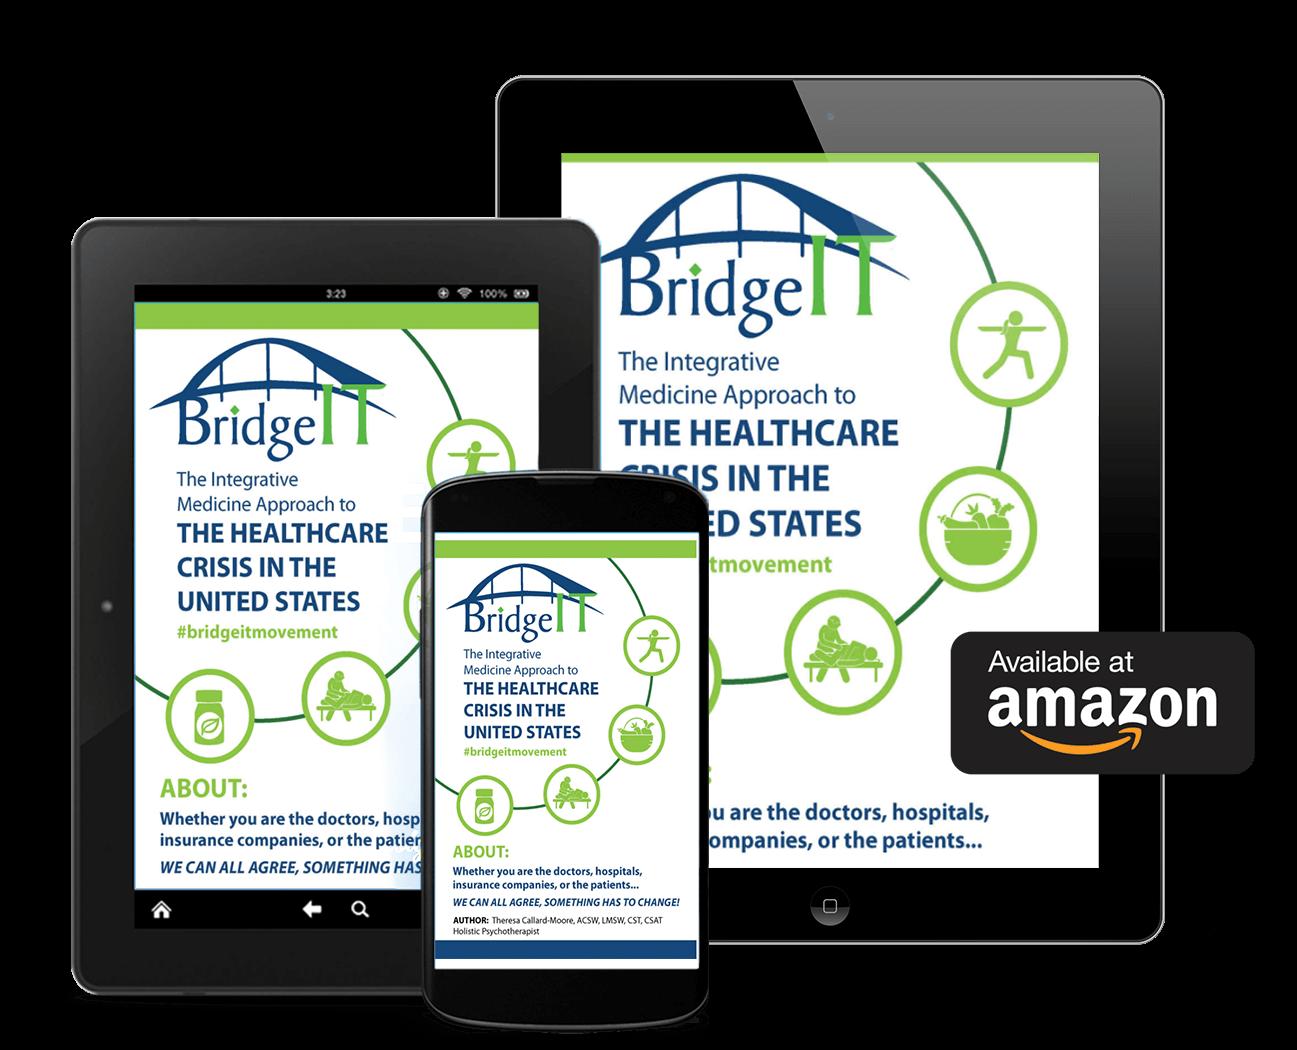 the-bridgeit-movement-holistic-health-book-available-on-amazon